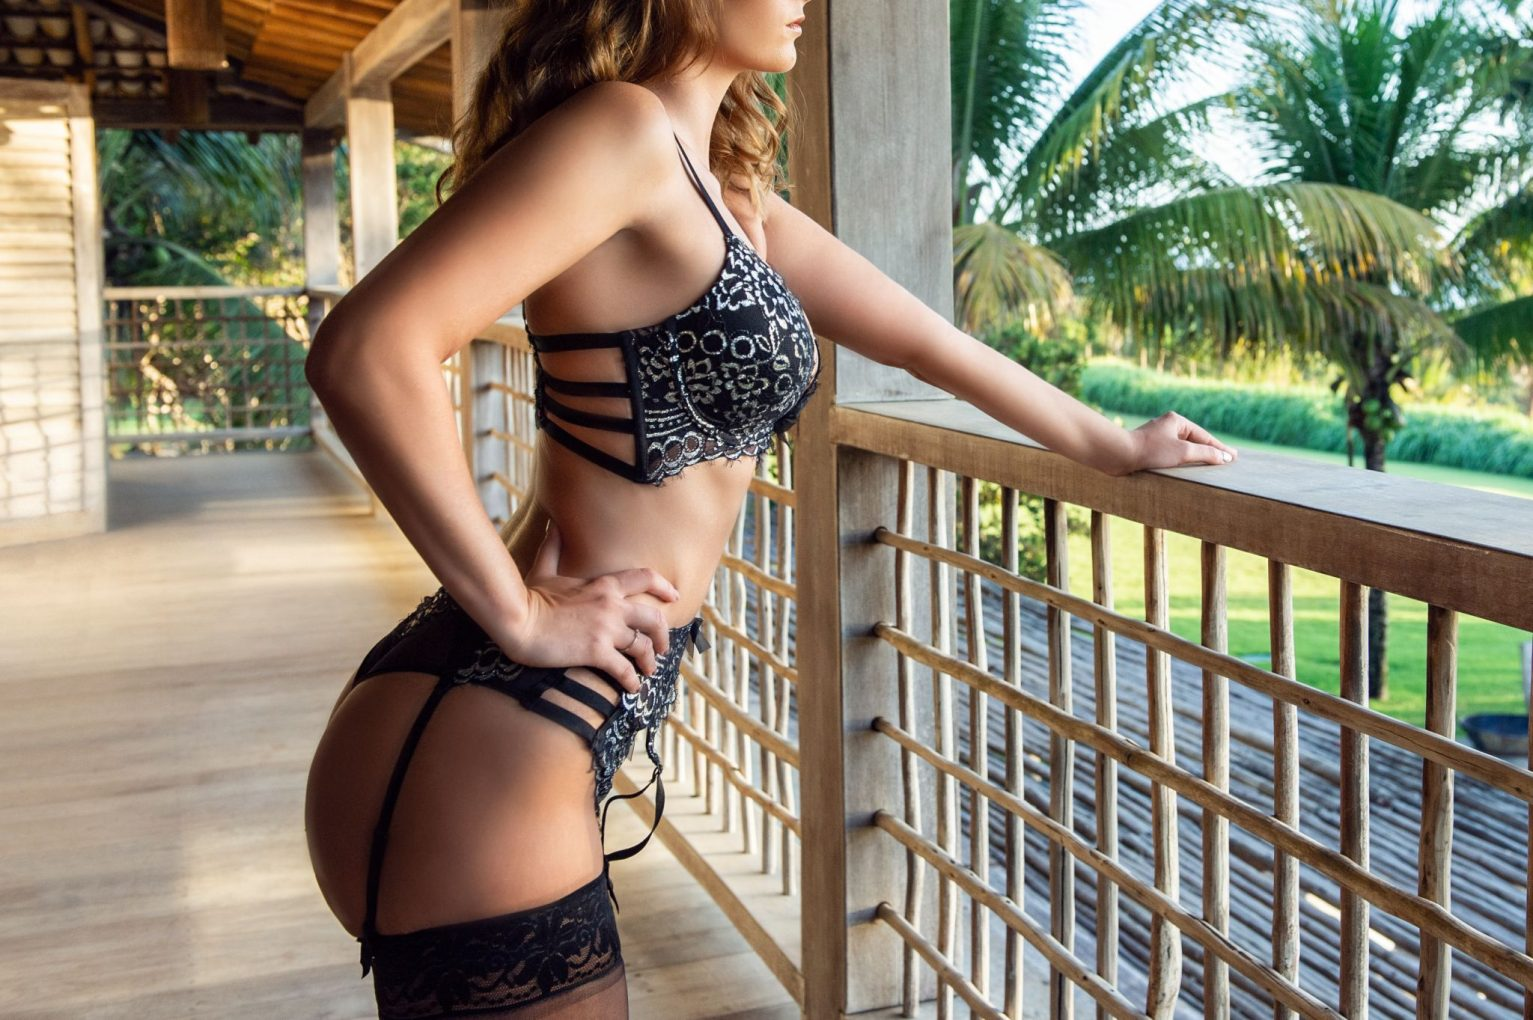 Gent luxury escort Amber